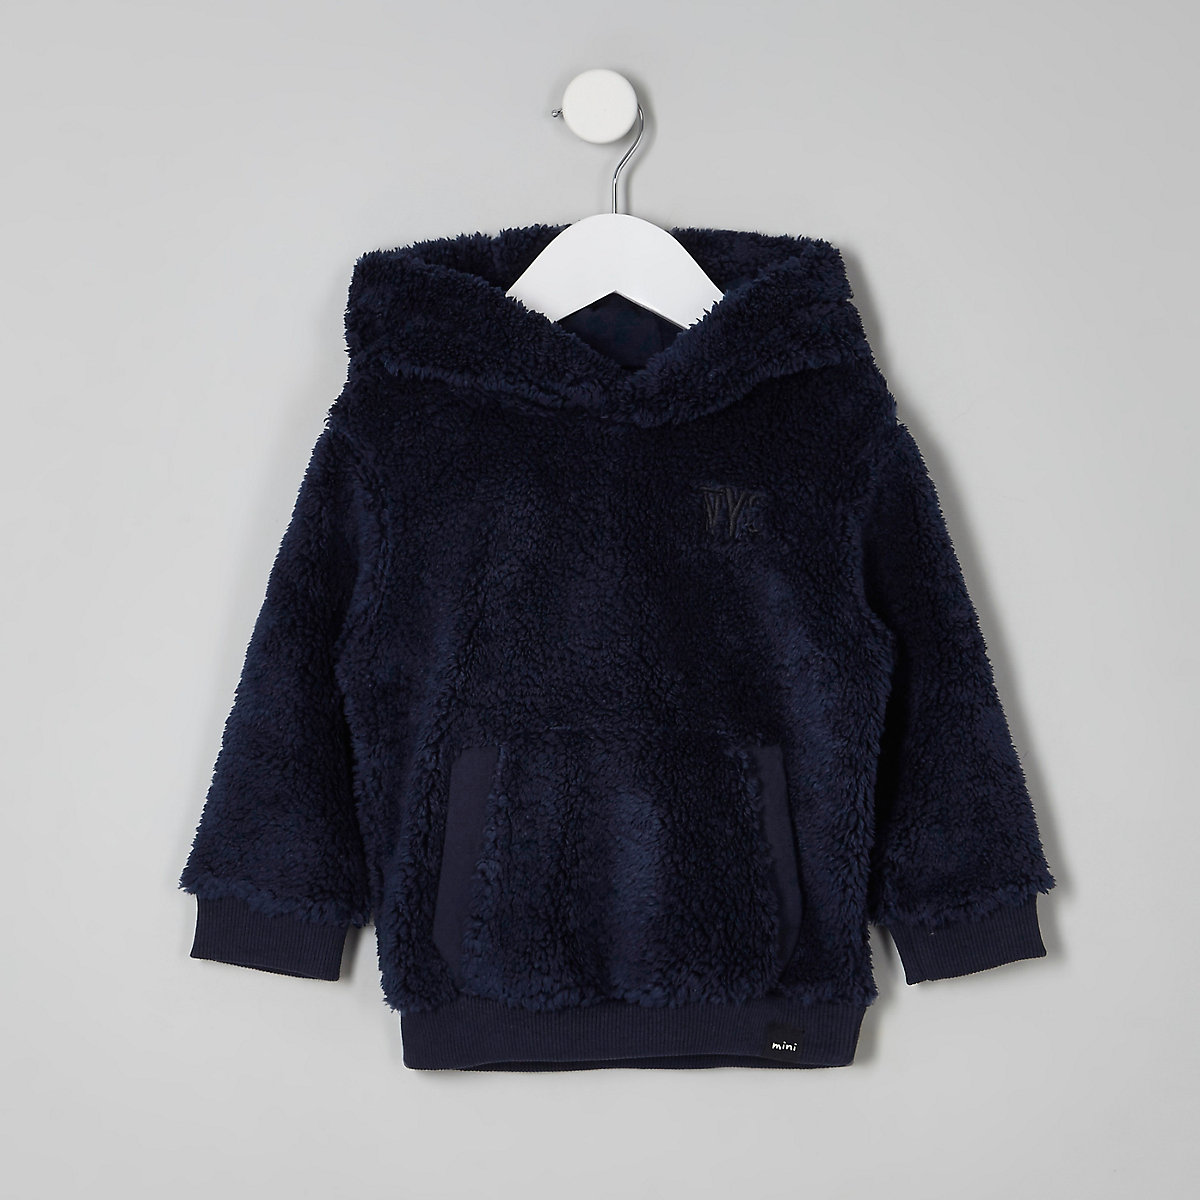 Sweat à capuche imitation mouton bleu marine mini garçon